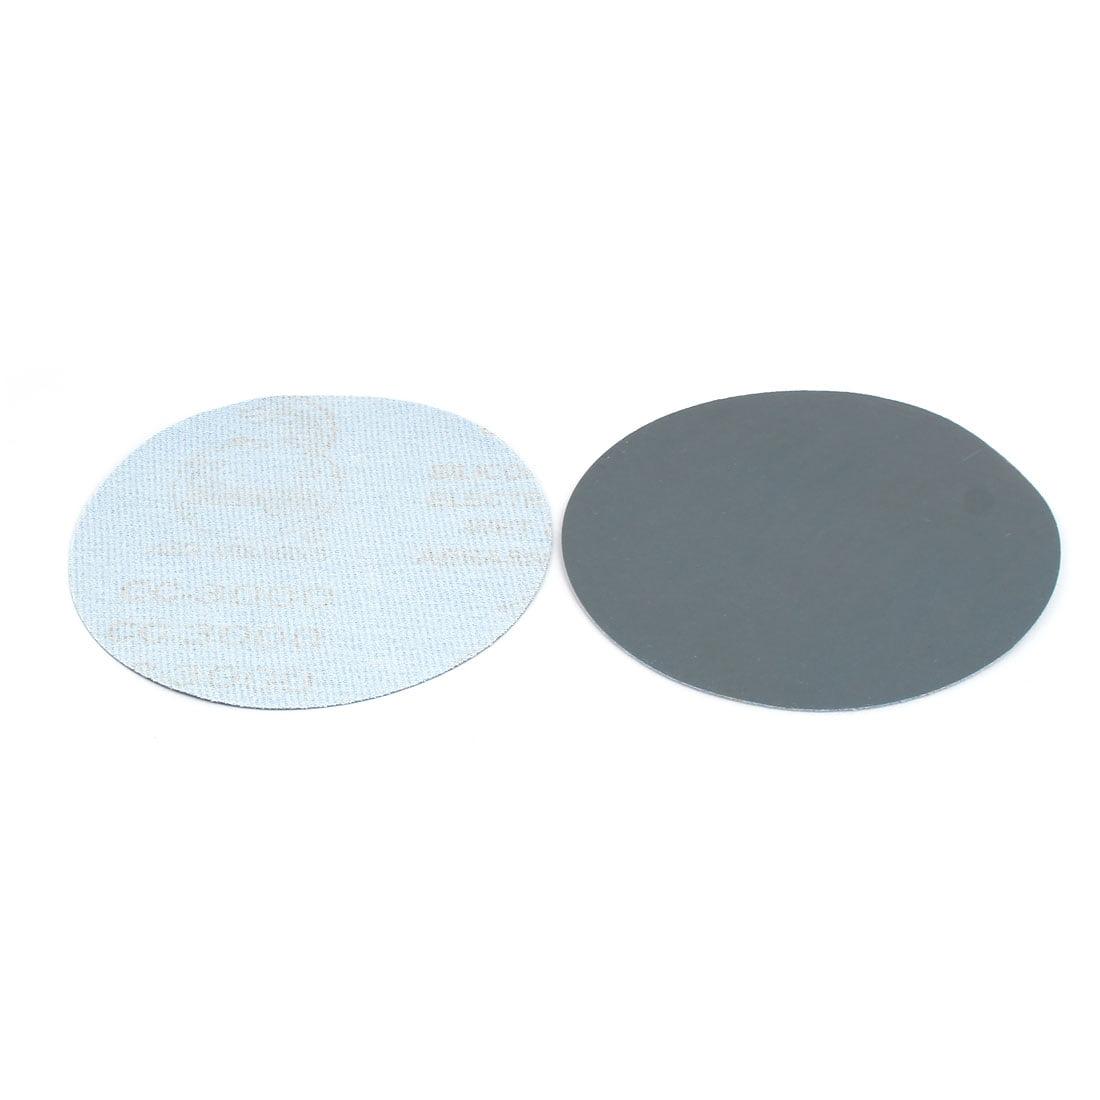 "Unique Bargains 3000 Grit 5"" Diameter Sandpaper Hook Loop Sanding Disc 5 Pcs - image 2 of 3"